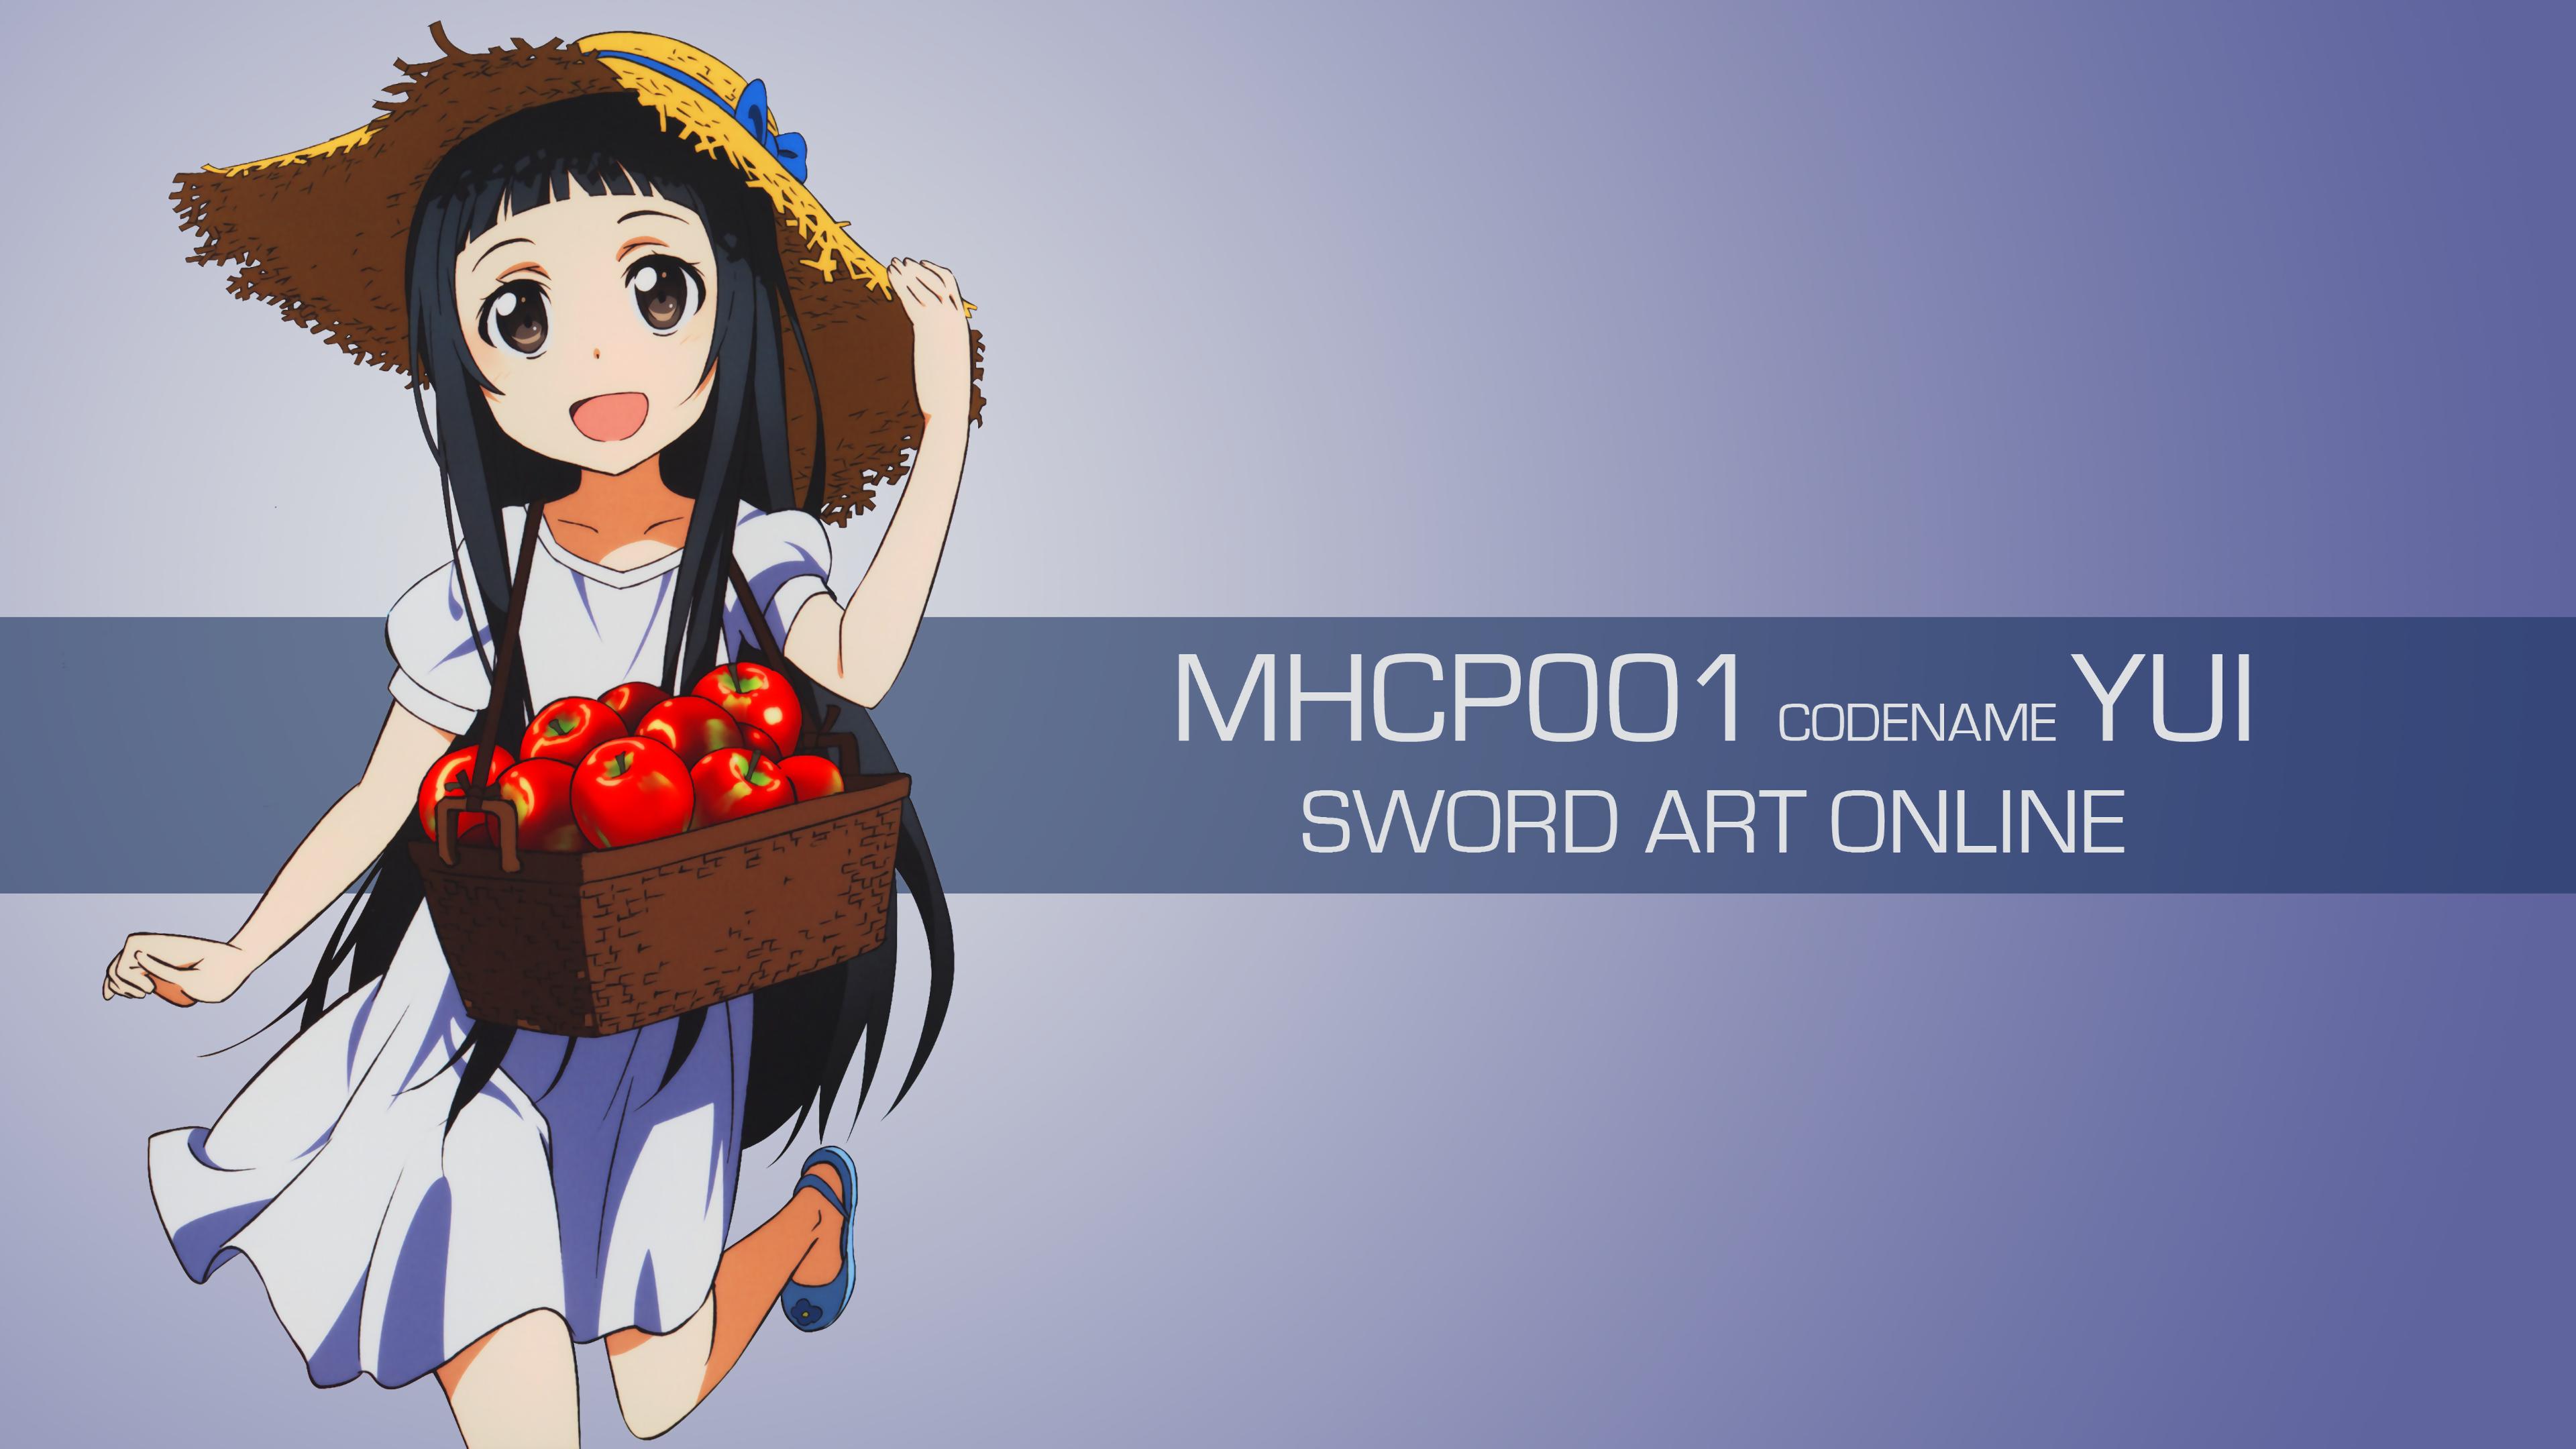 Sword Art Online 4k Ultra HD Wallpaper | Background Image ... Sword Art Online Wallpaper 1920x1080 Yui